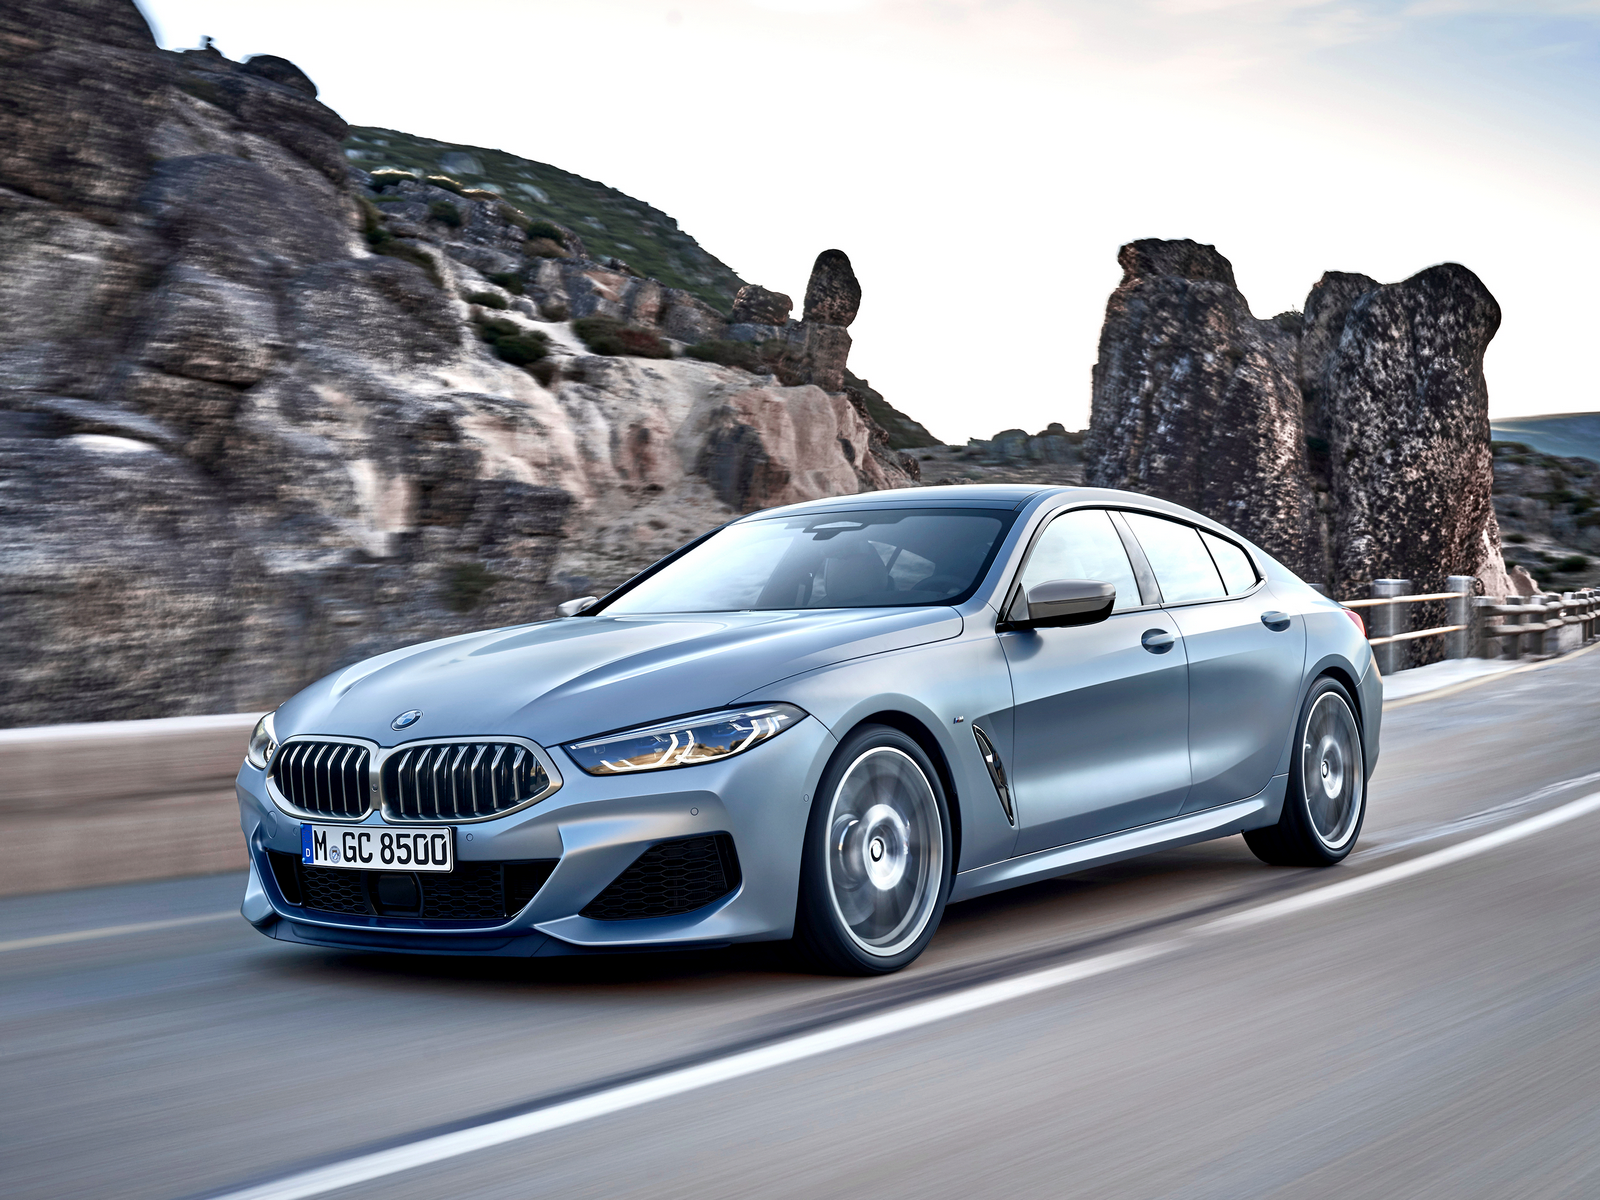 BMW 8 Series Gran Coupe: четыре двери, растянутая база и 2,5 пассажира во втором ряду